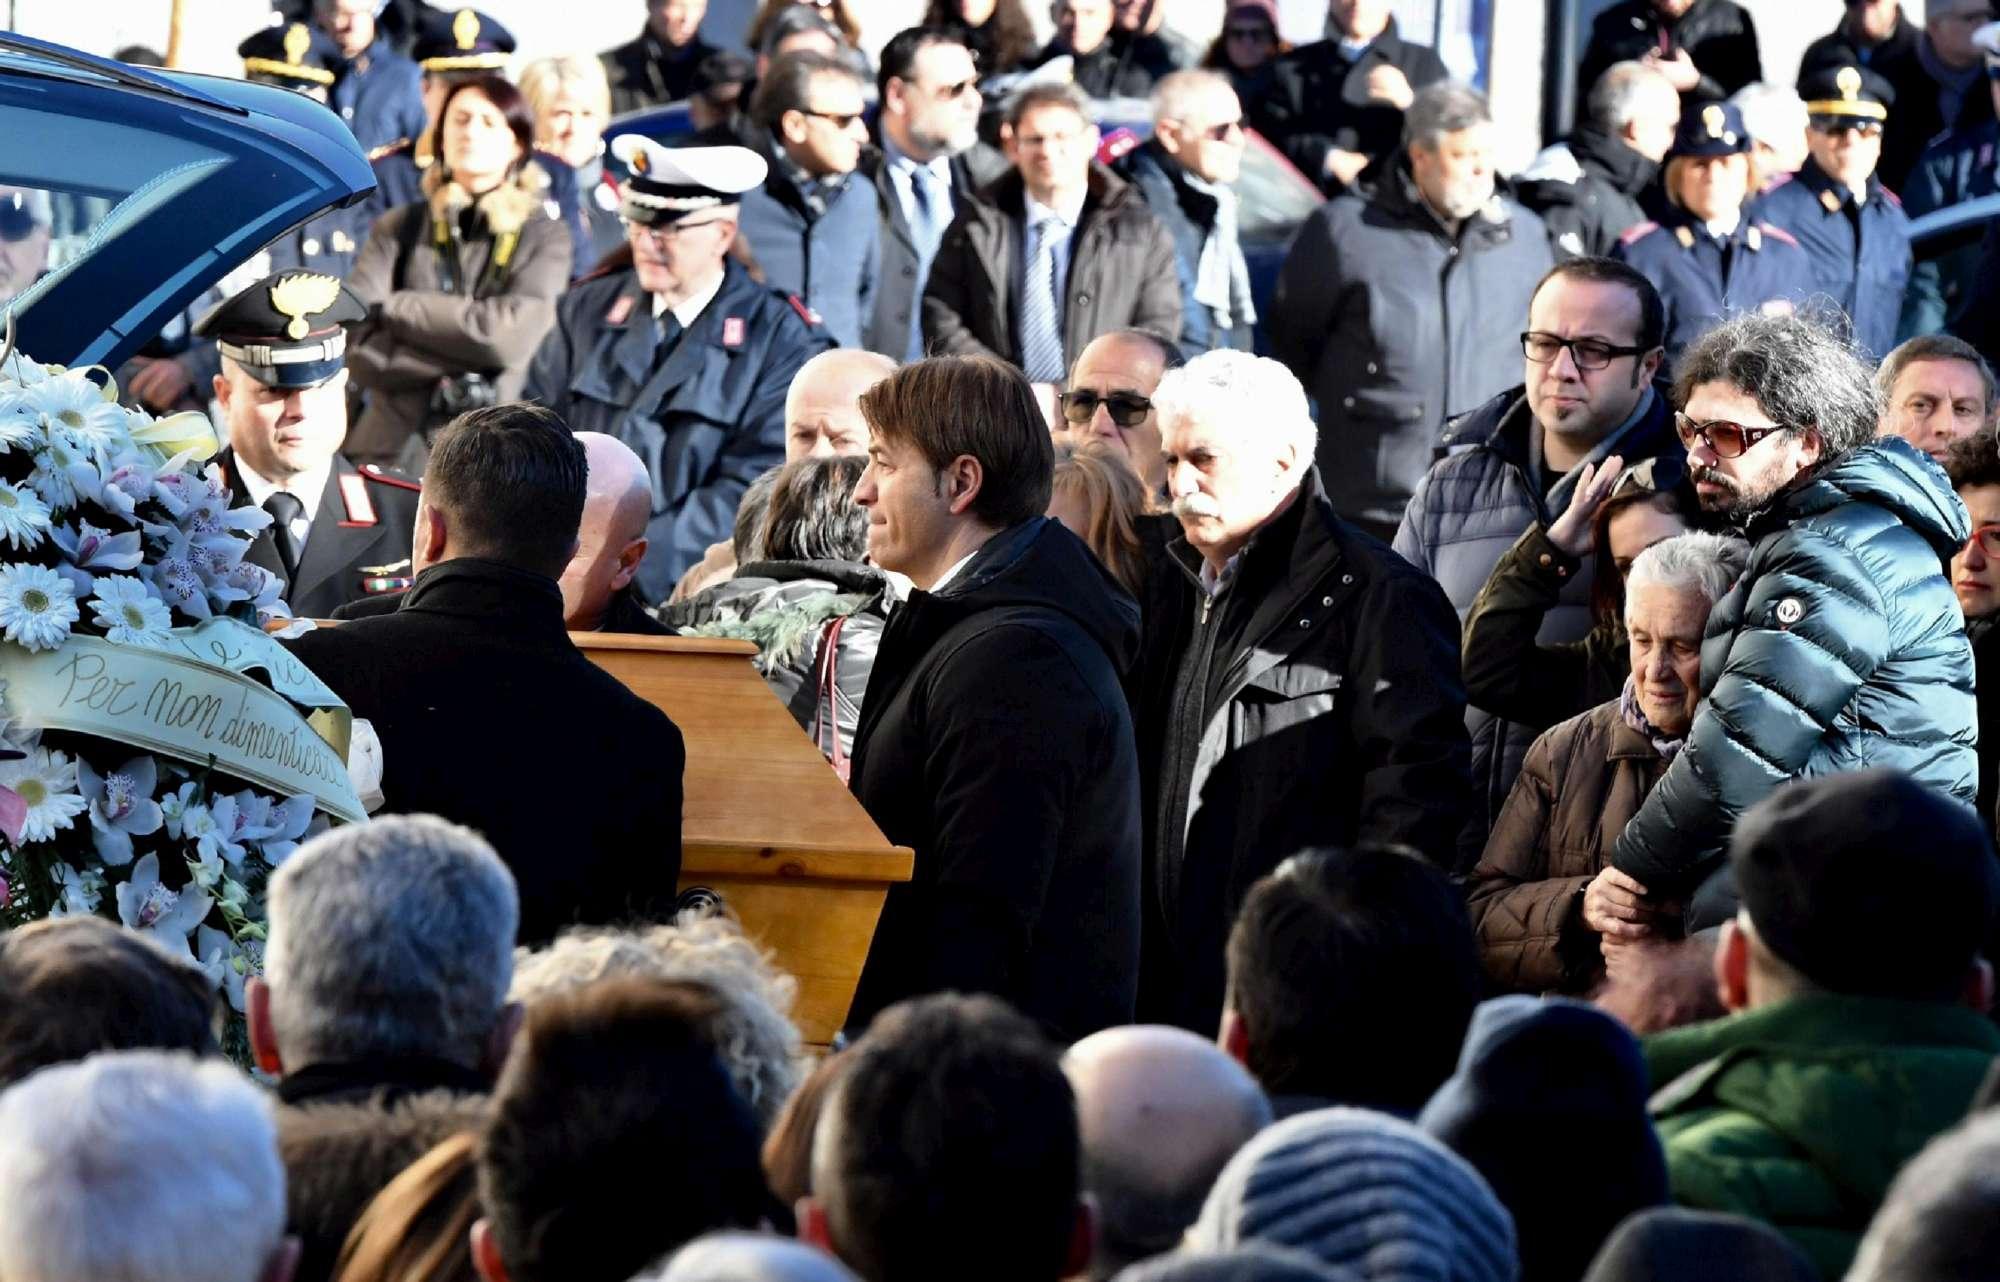 Strage di Berlino, celebrati a Sulmona i funerali di Fabrizia Di Lorenzo